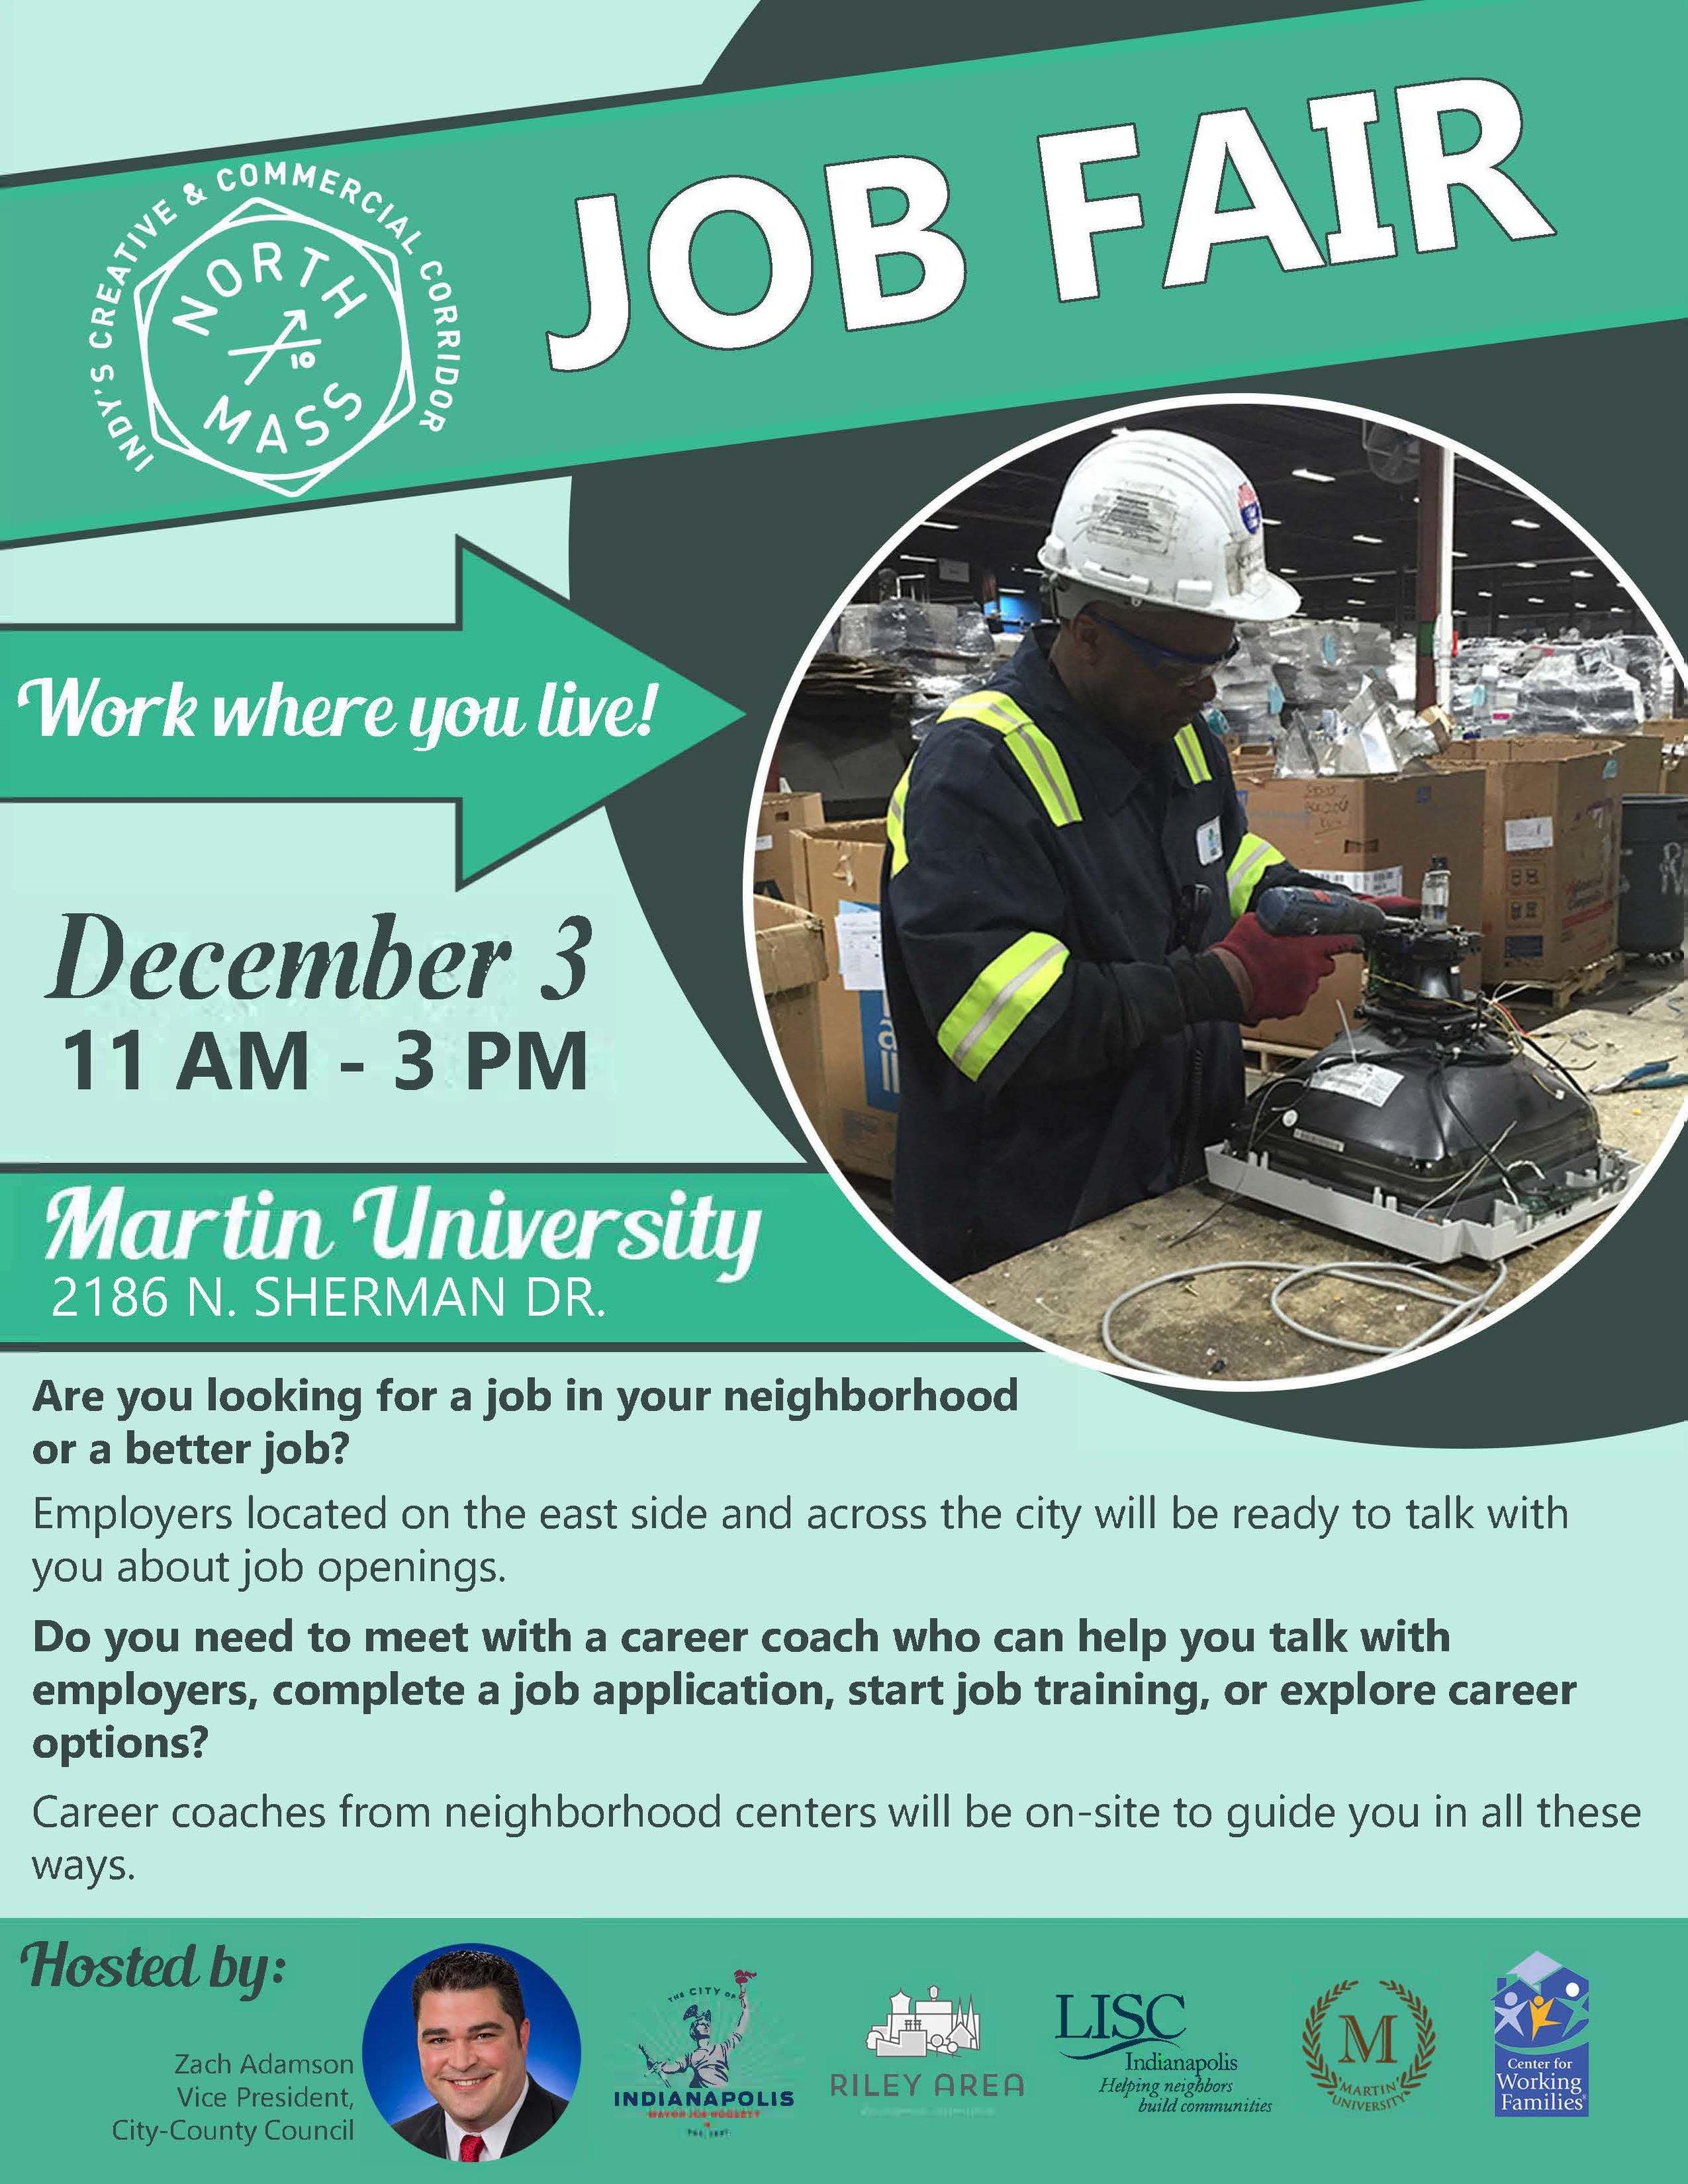 Martin University Job Fair_Residents_compressed 120318.jpg